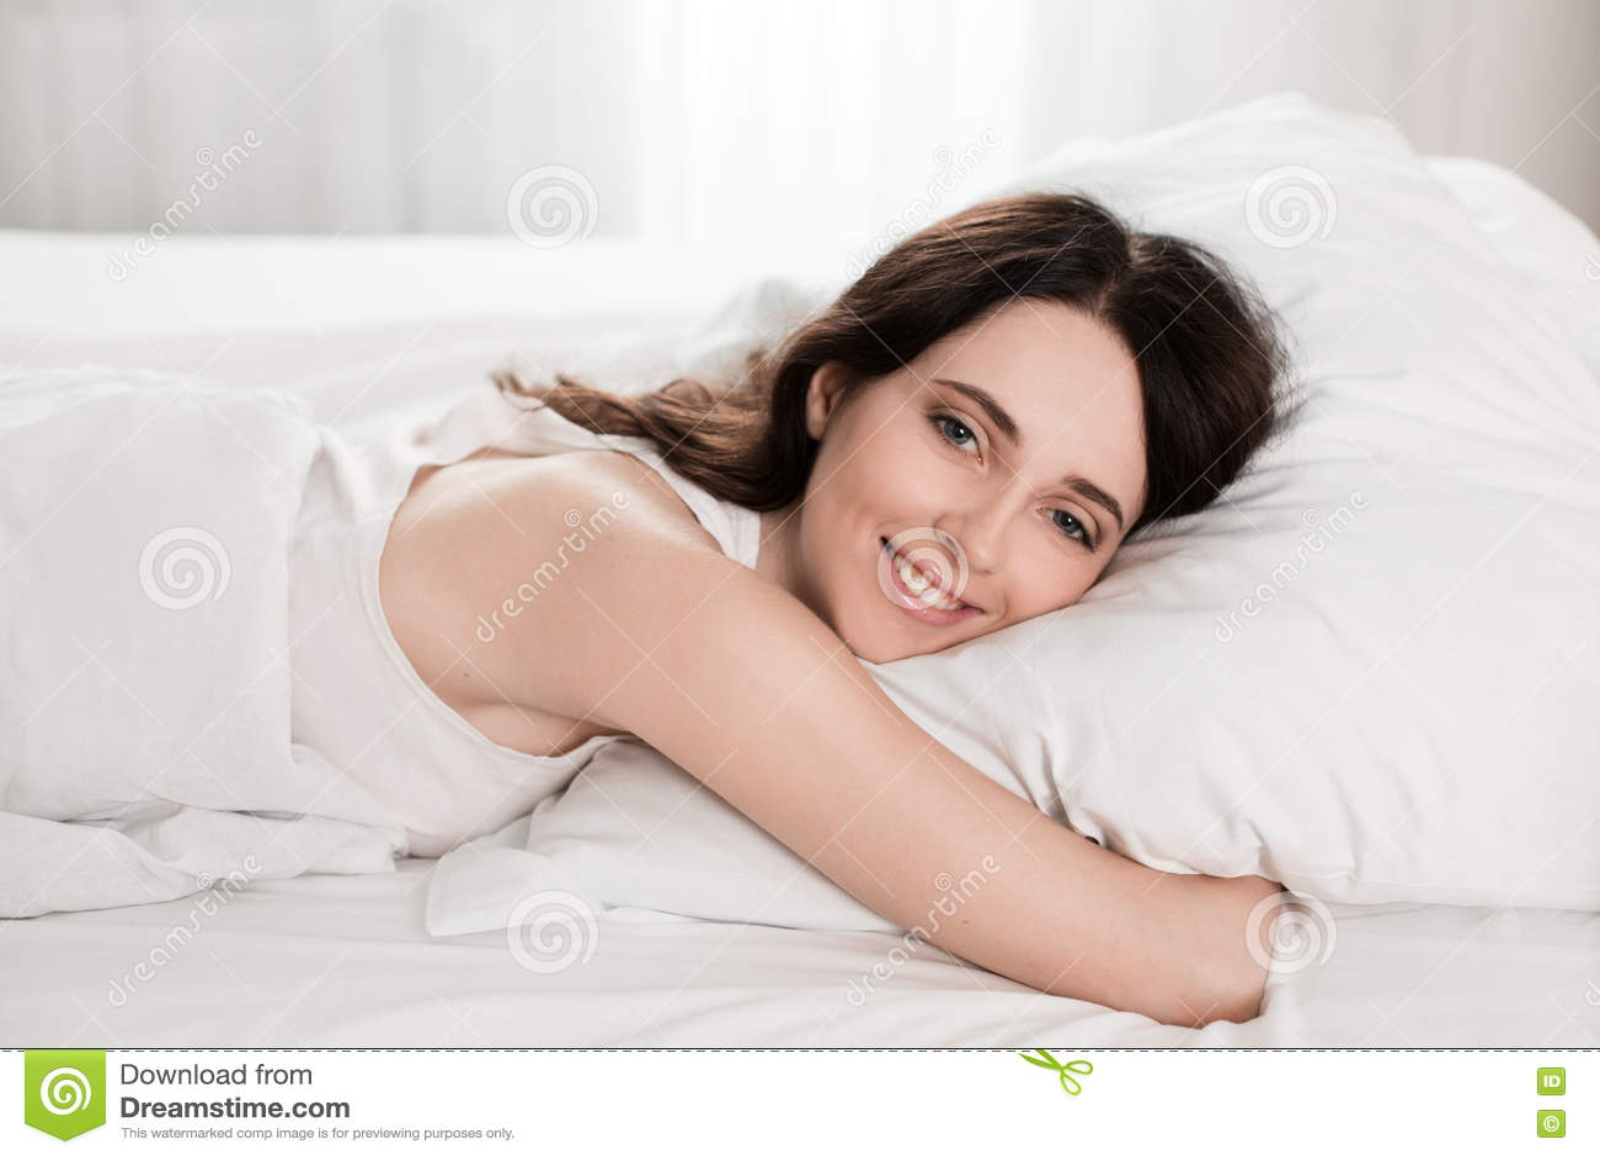 young sleeping Naked girls